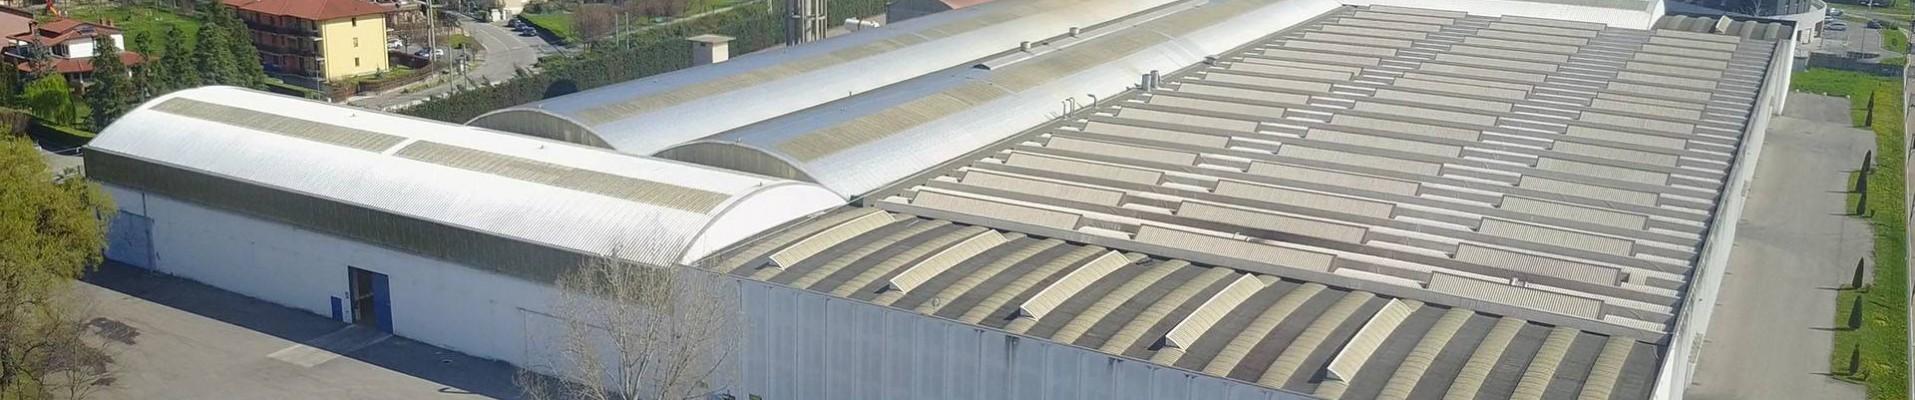 Foto aérea de las instalaciones de Acciaitubi